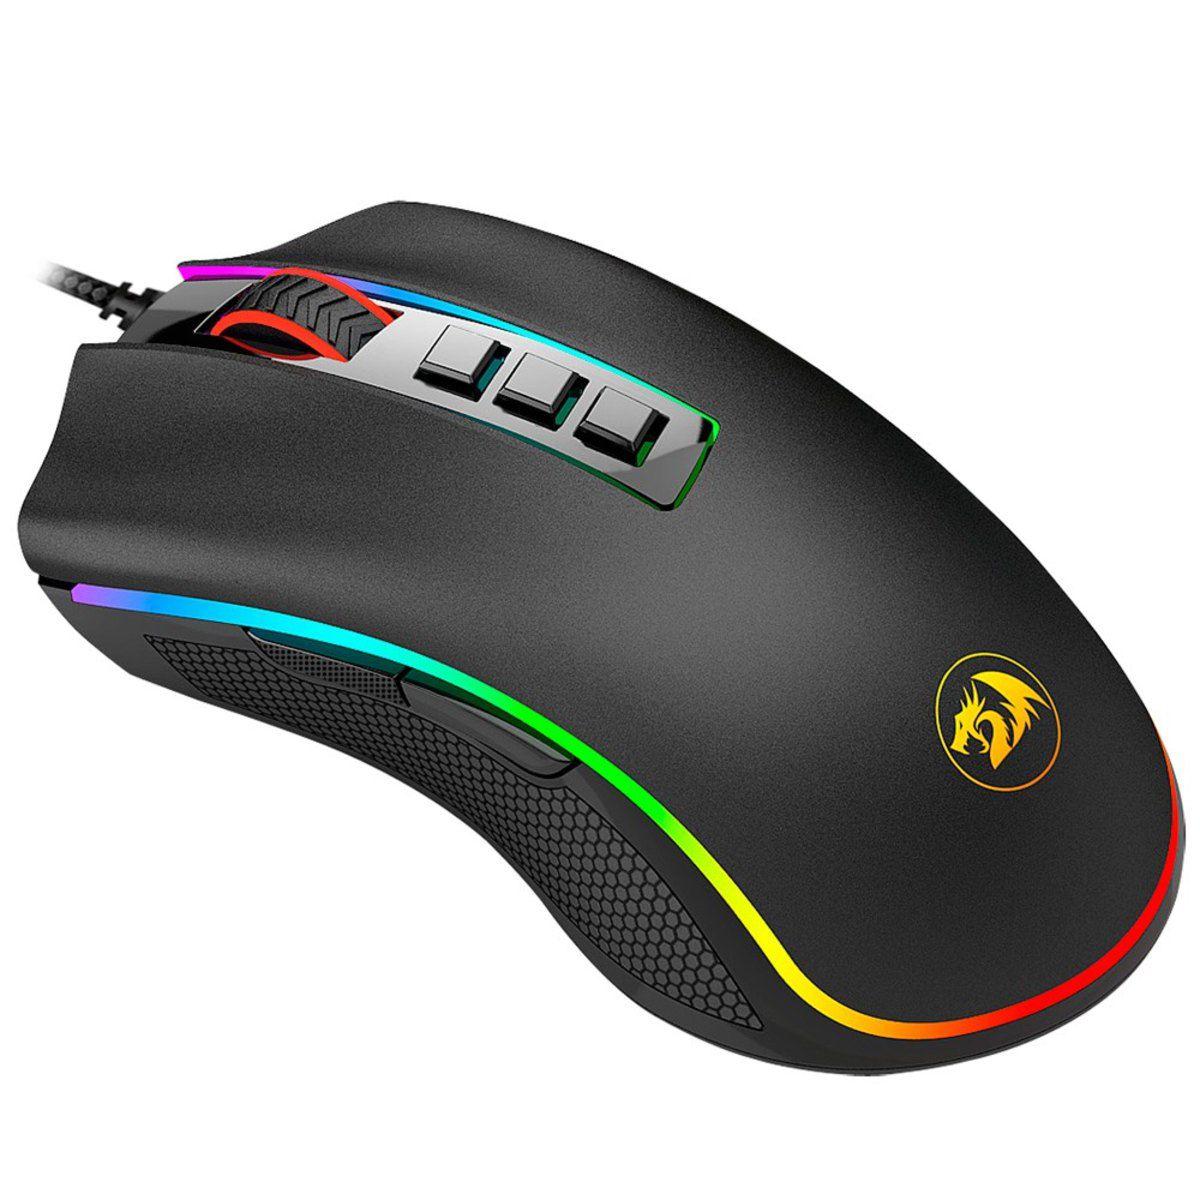 Mouse Gamer Redragon King Cobra Chroma M711-FPS RGB